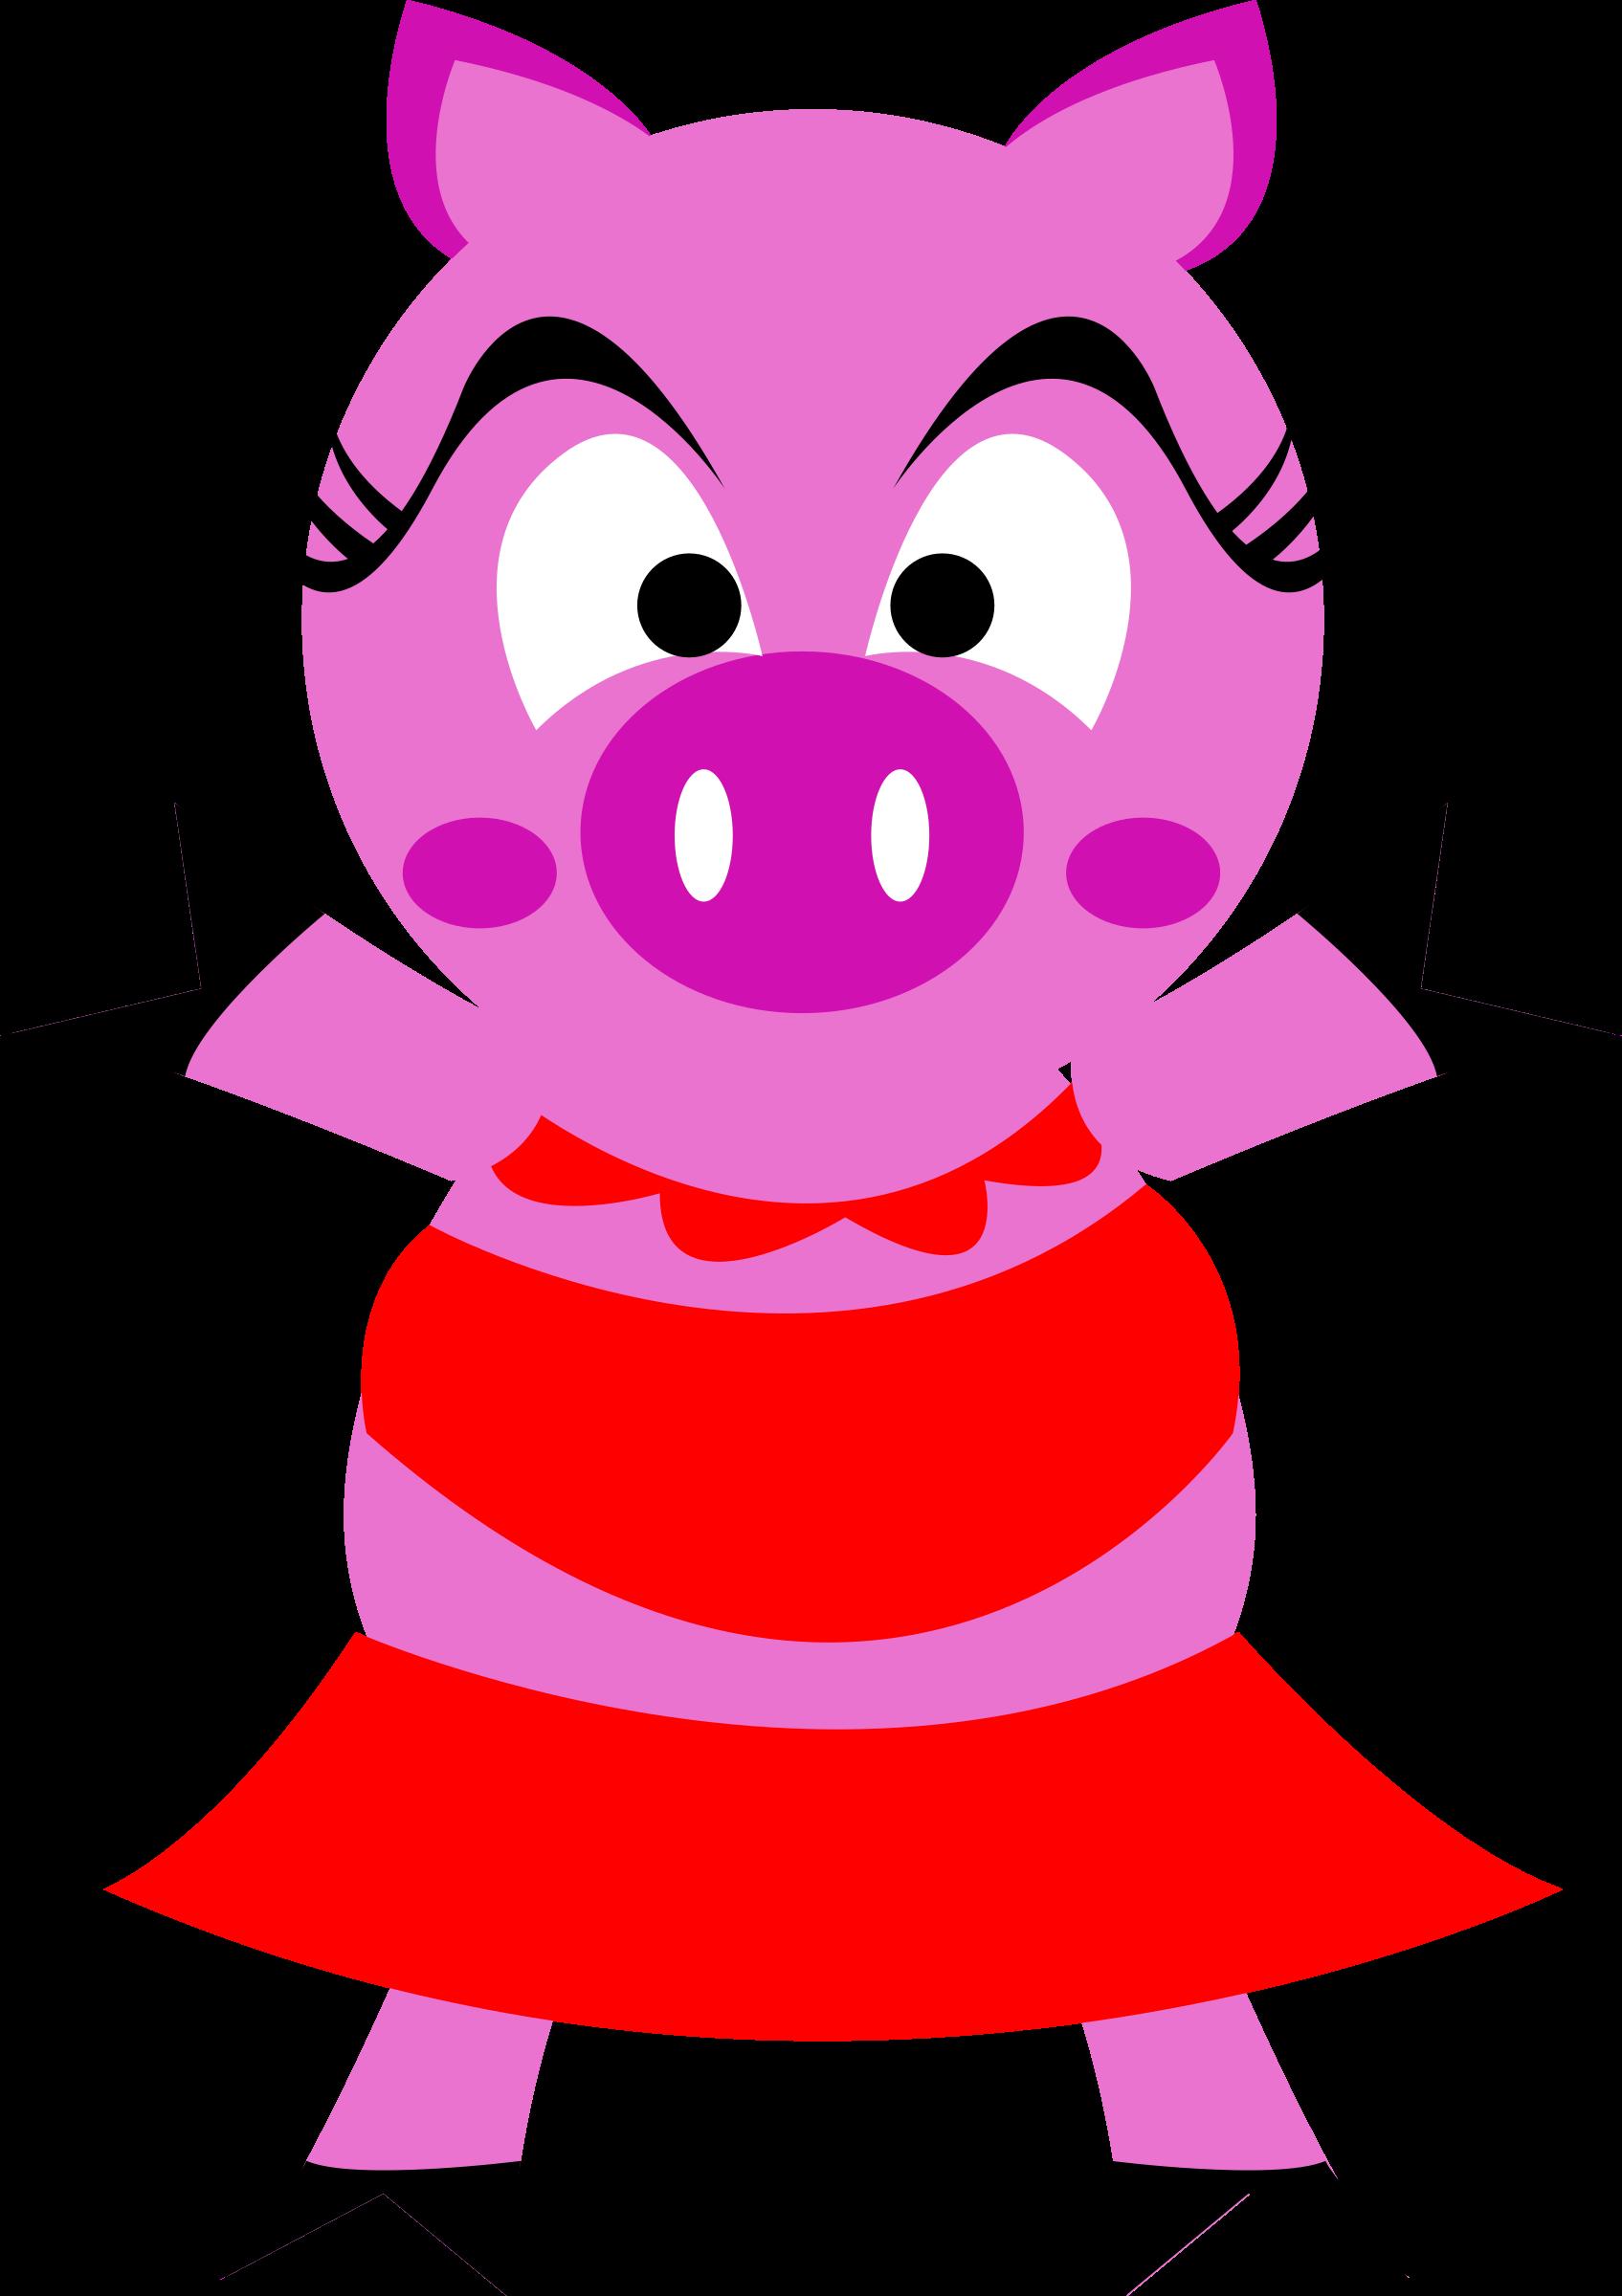 Madame big image png. Clipart pig character